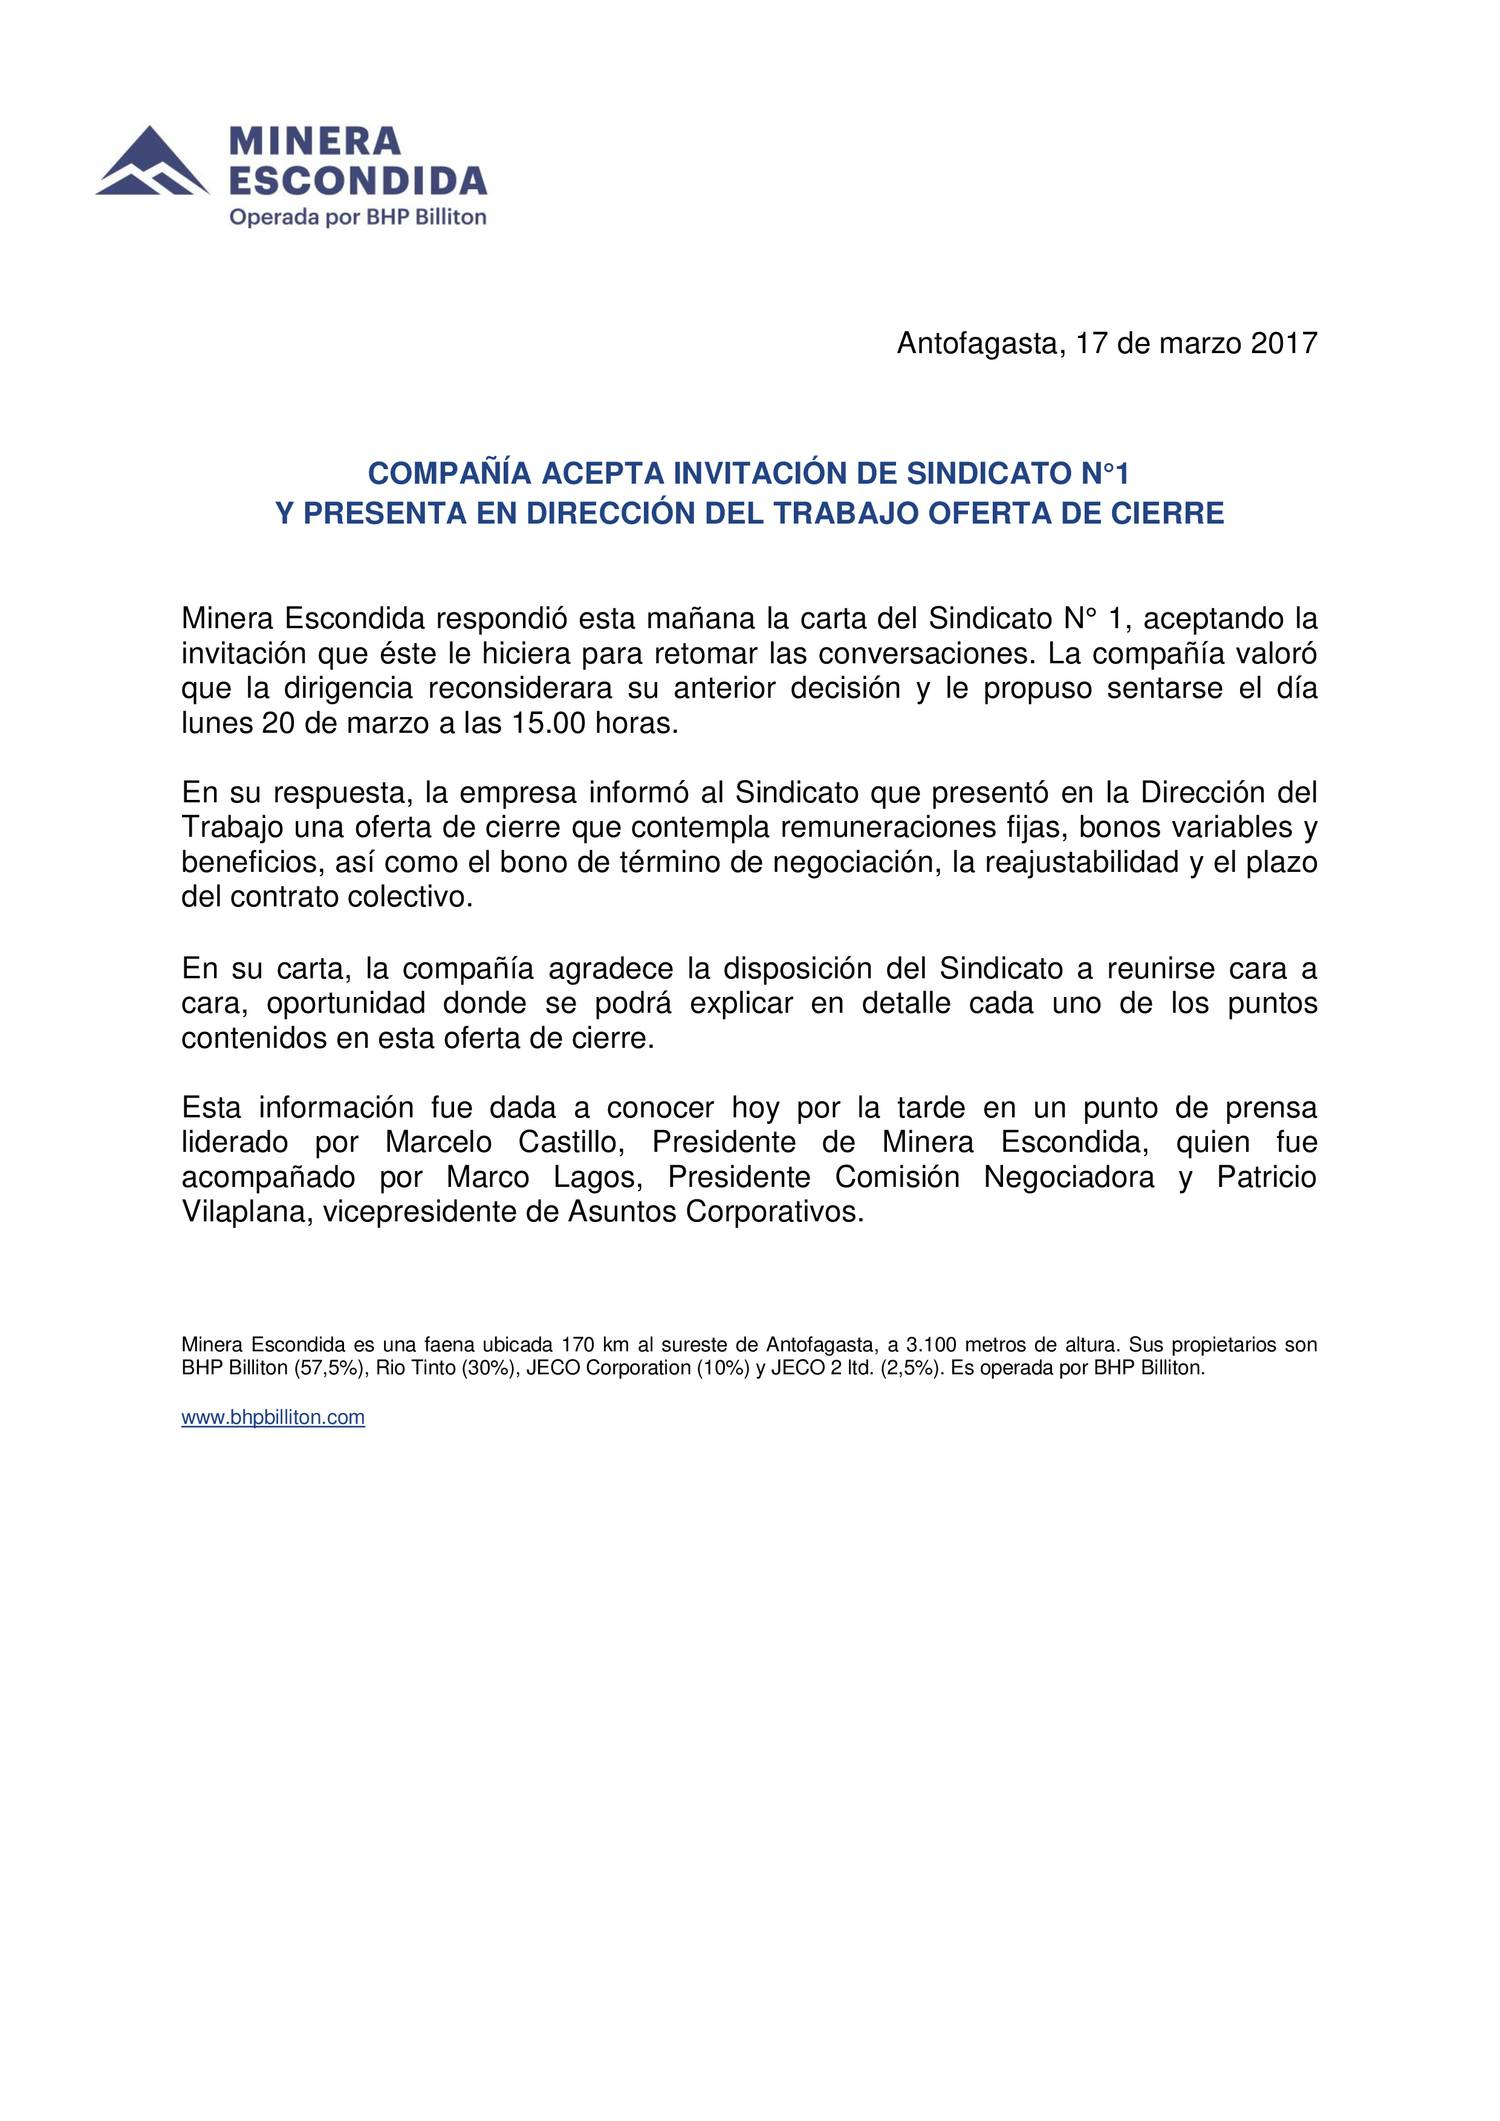 Comunicado de Prensa Minera Escondida.docx - DocDroid